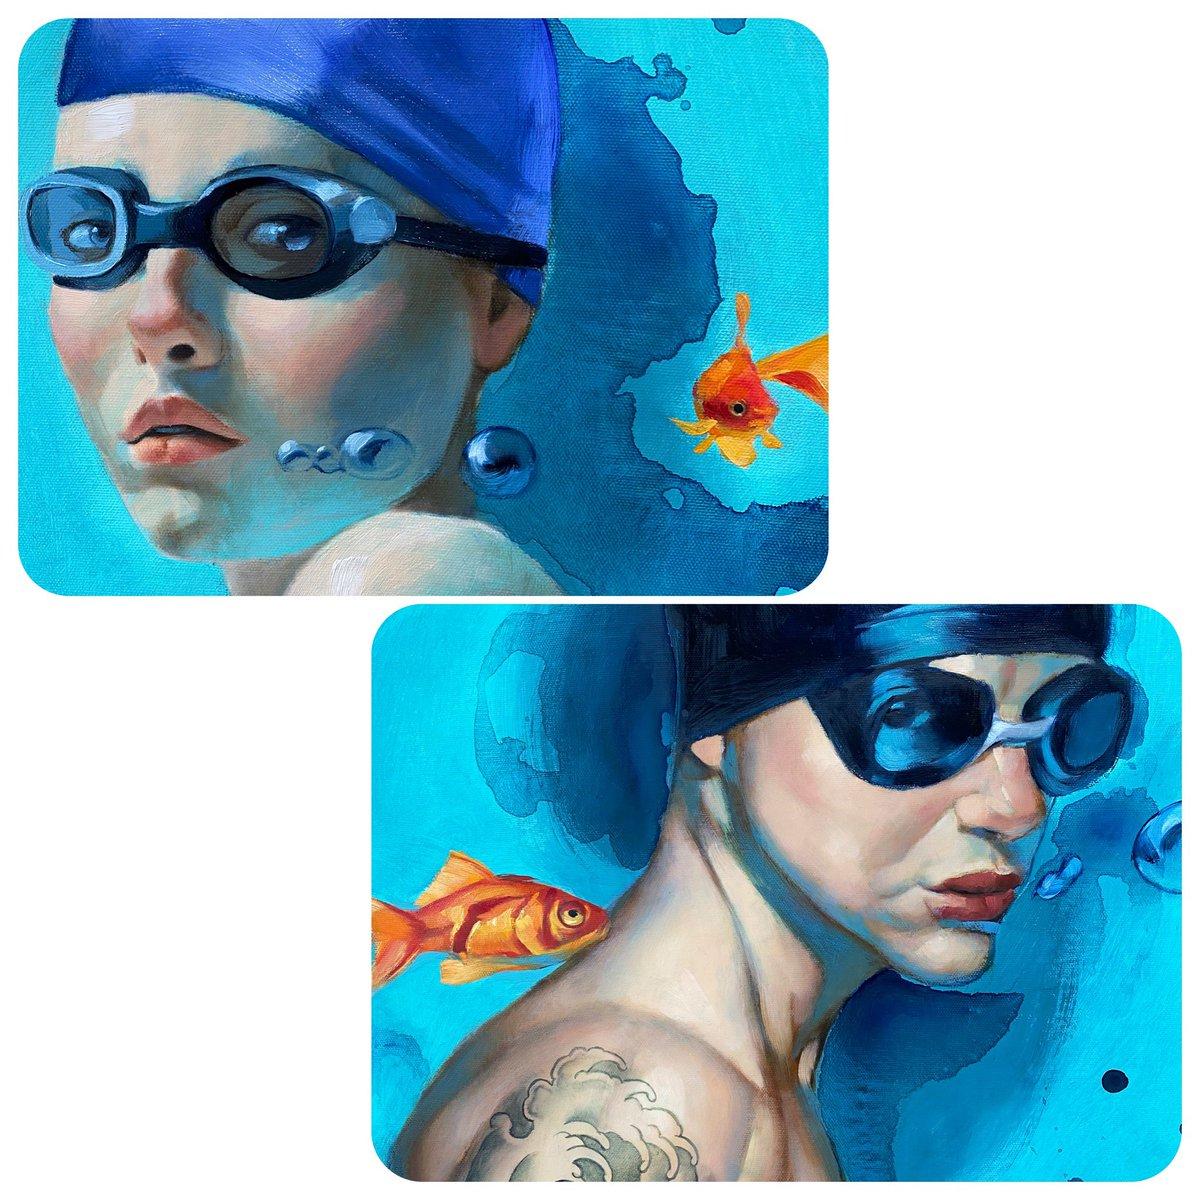 Serie Nadadores  #nadadores #fernandovicente https://t.co/aWtsrM3DF9